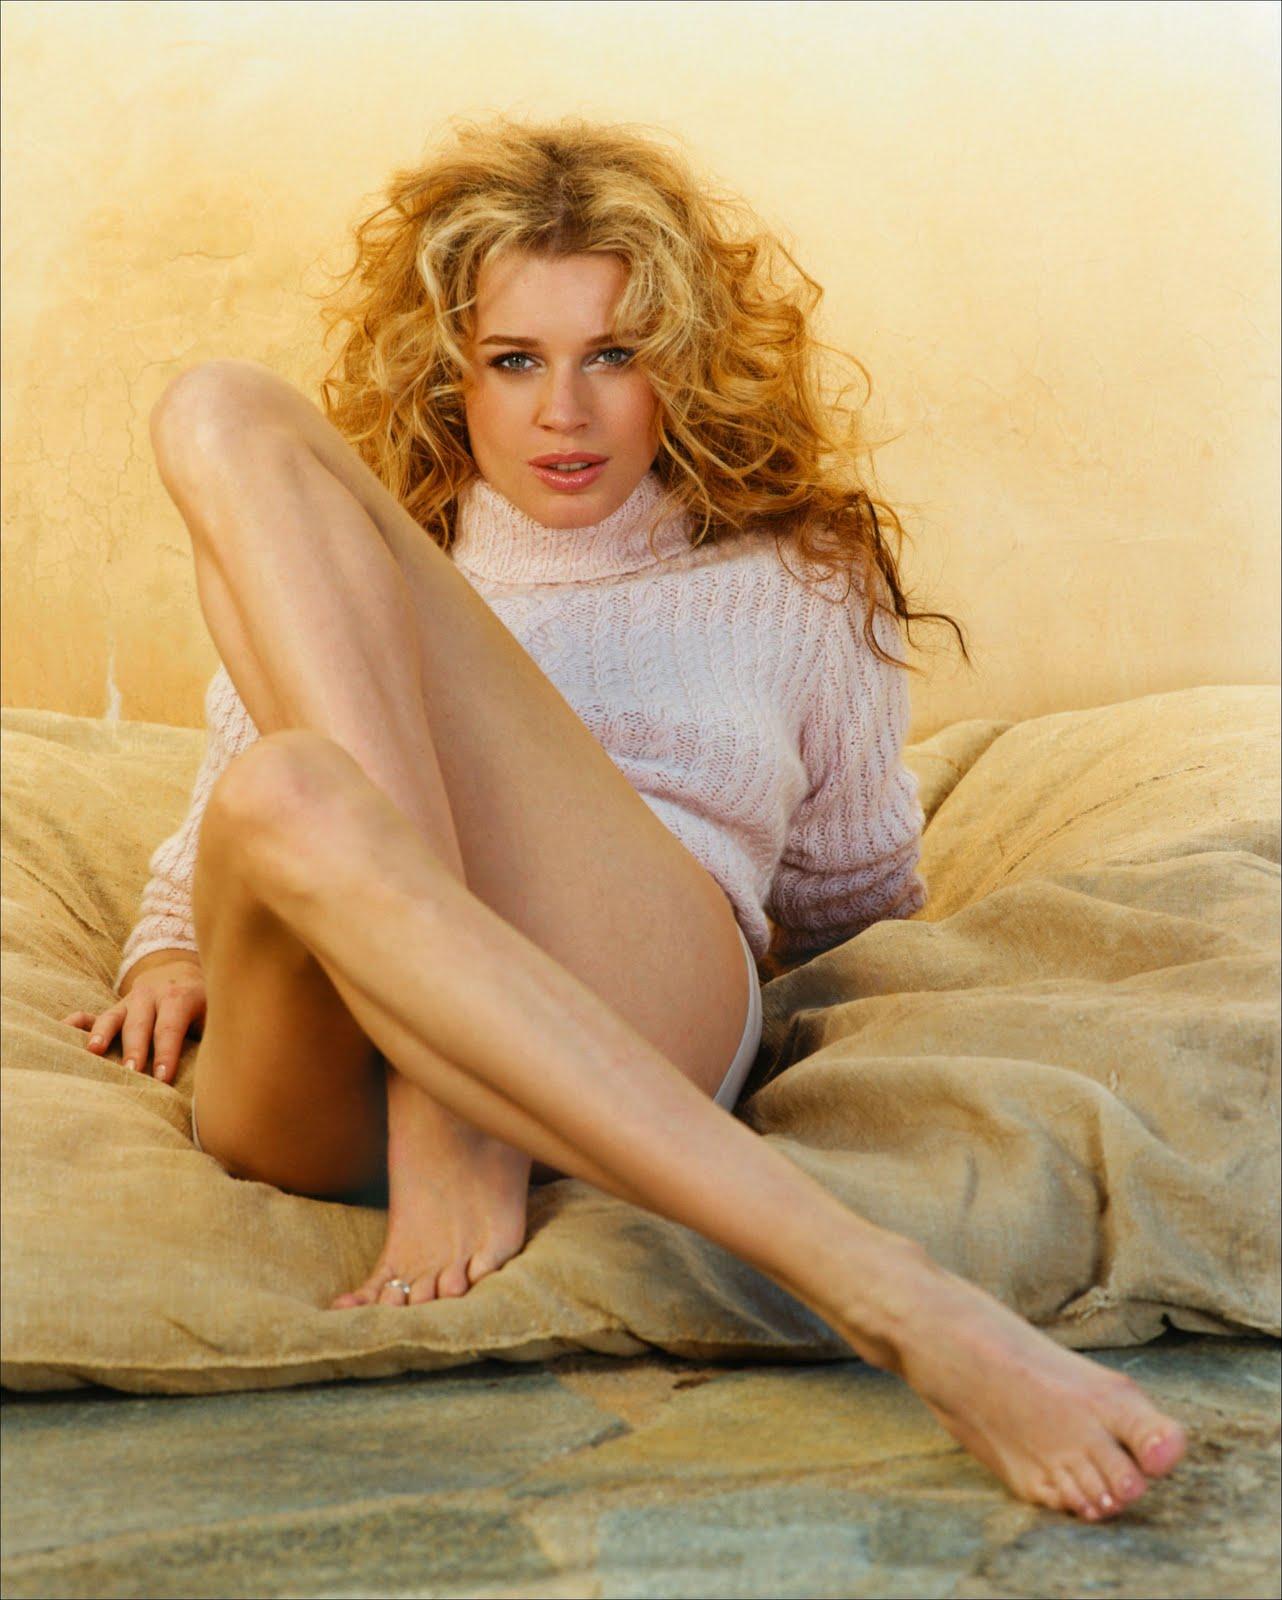 sexy hot portugise girls nude picks